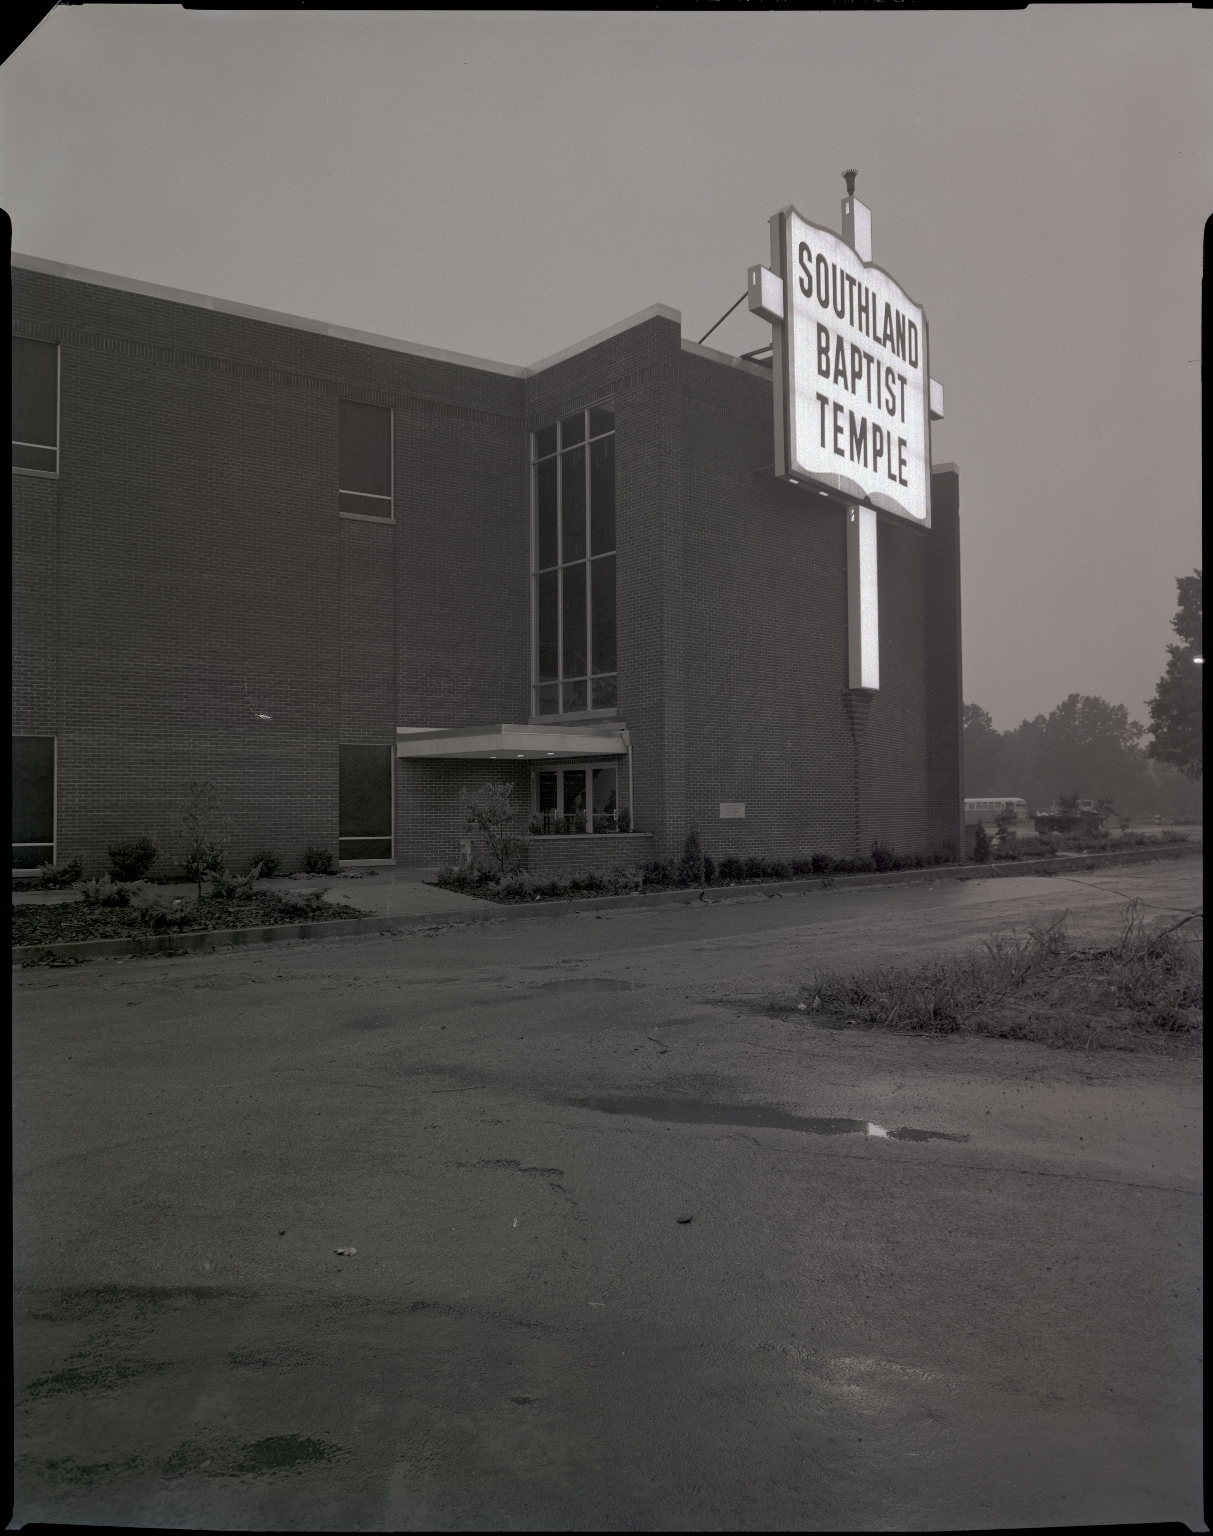 Southland Baptist Temple